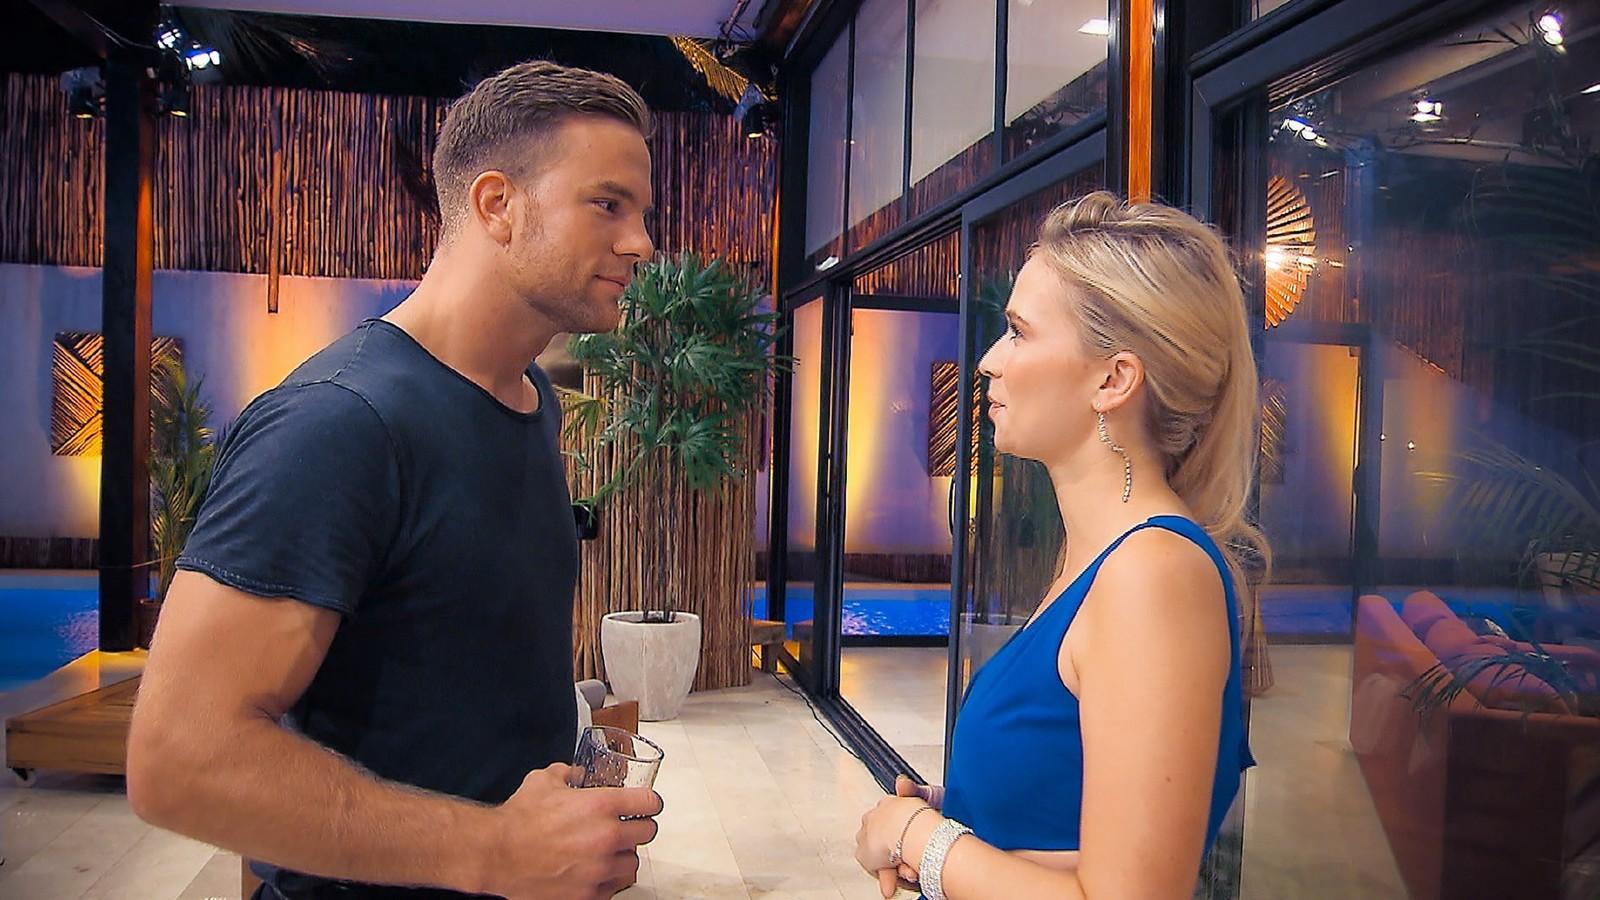 Sebastian und Denise-Jessica